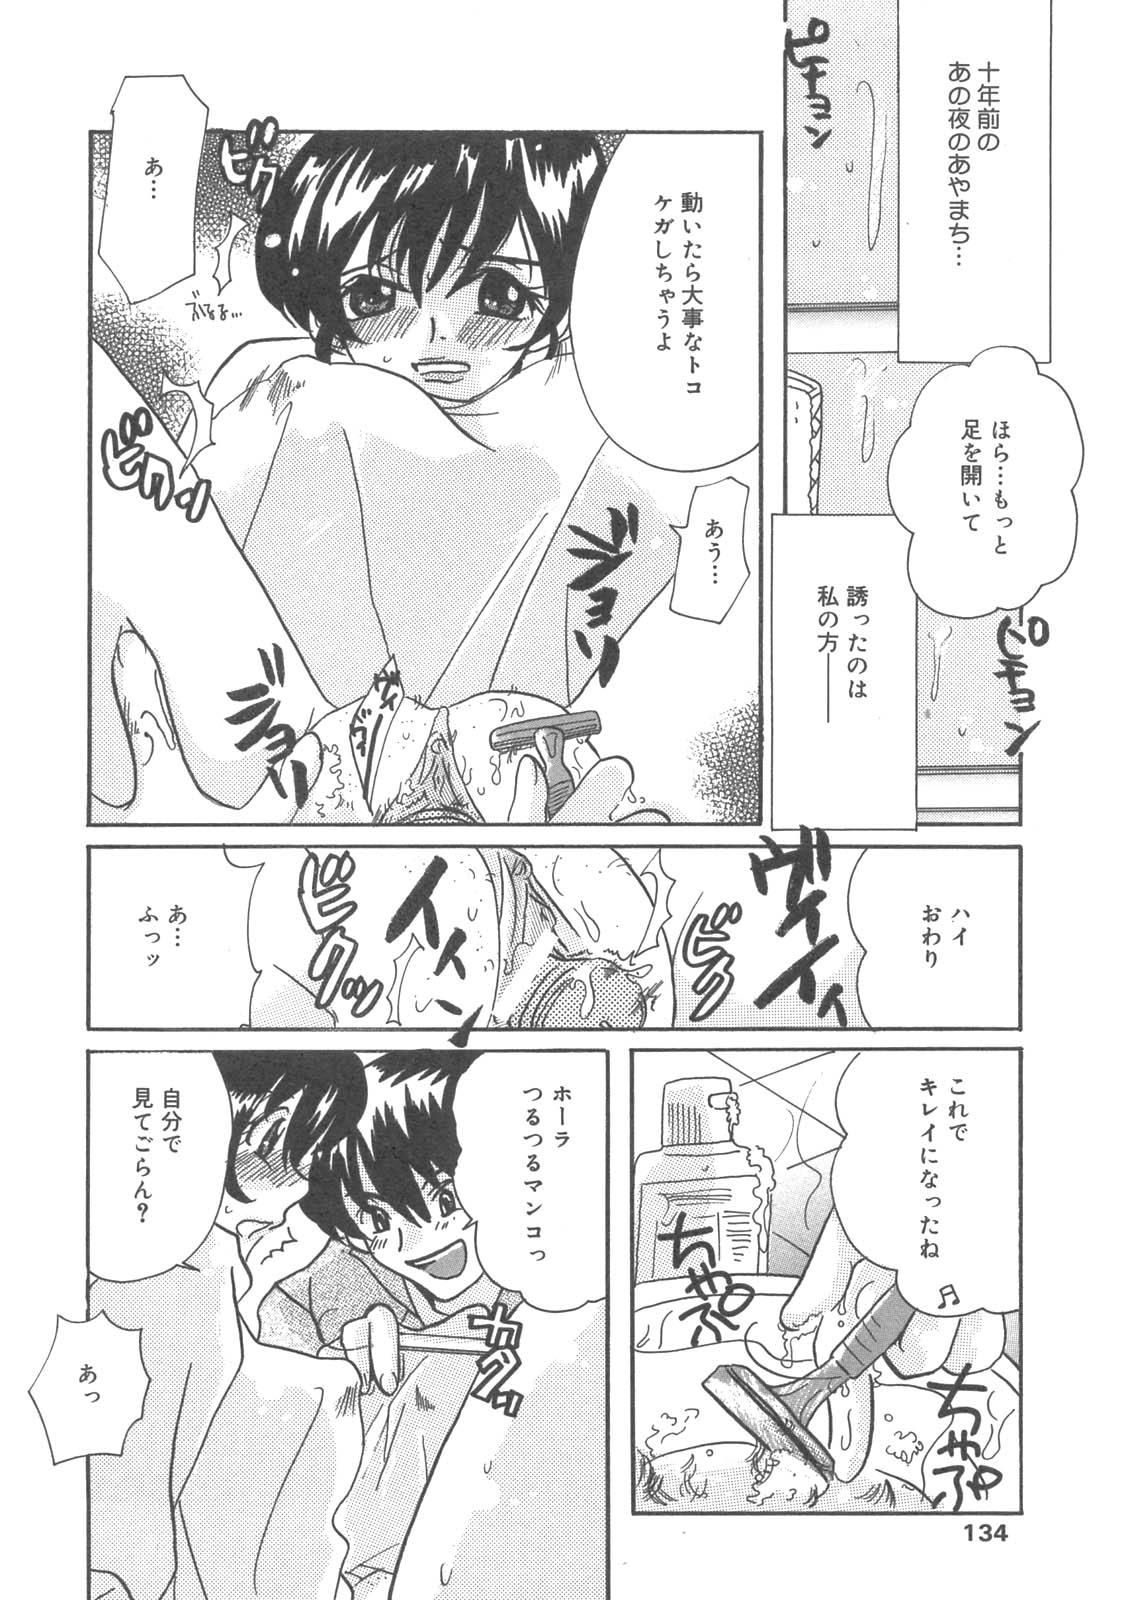 Kanbo Choukyou Sora 130